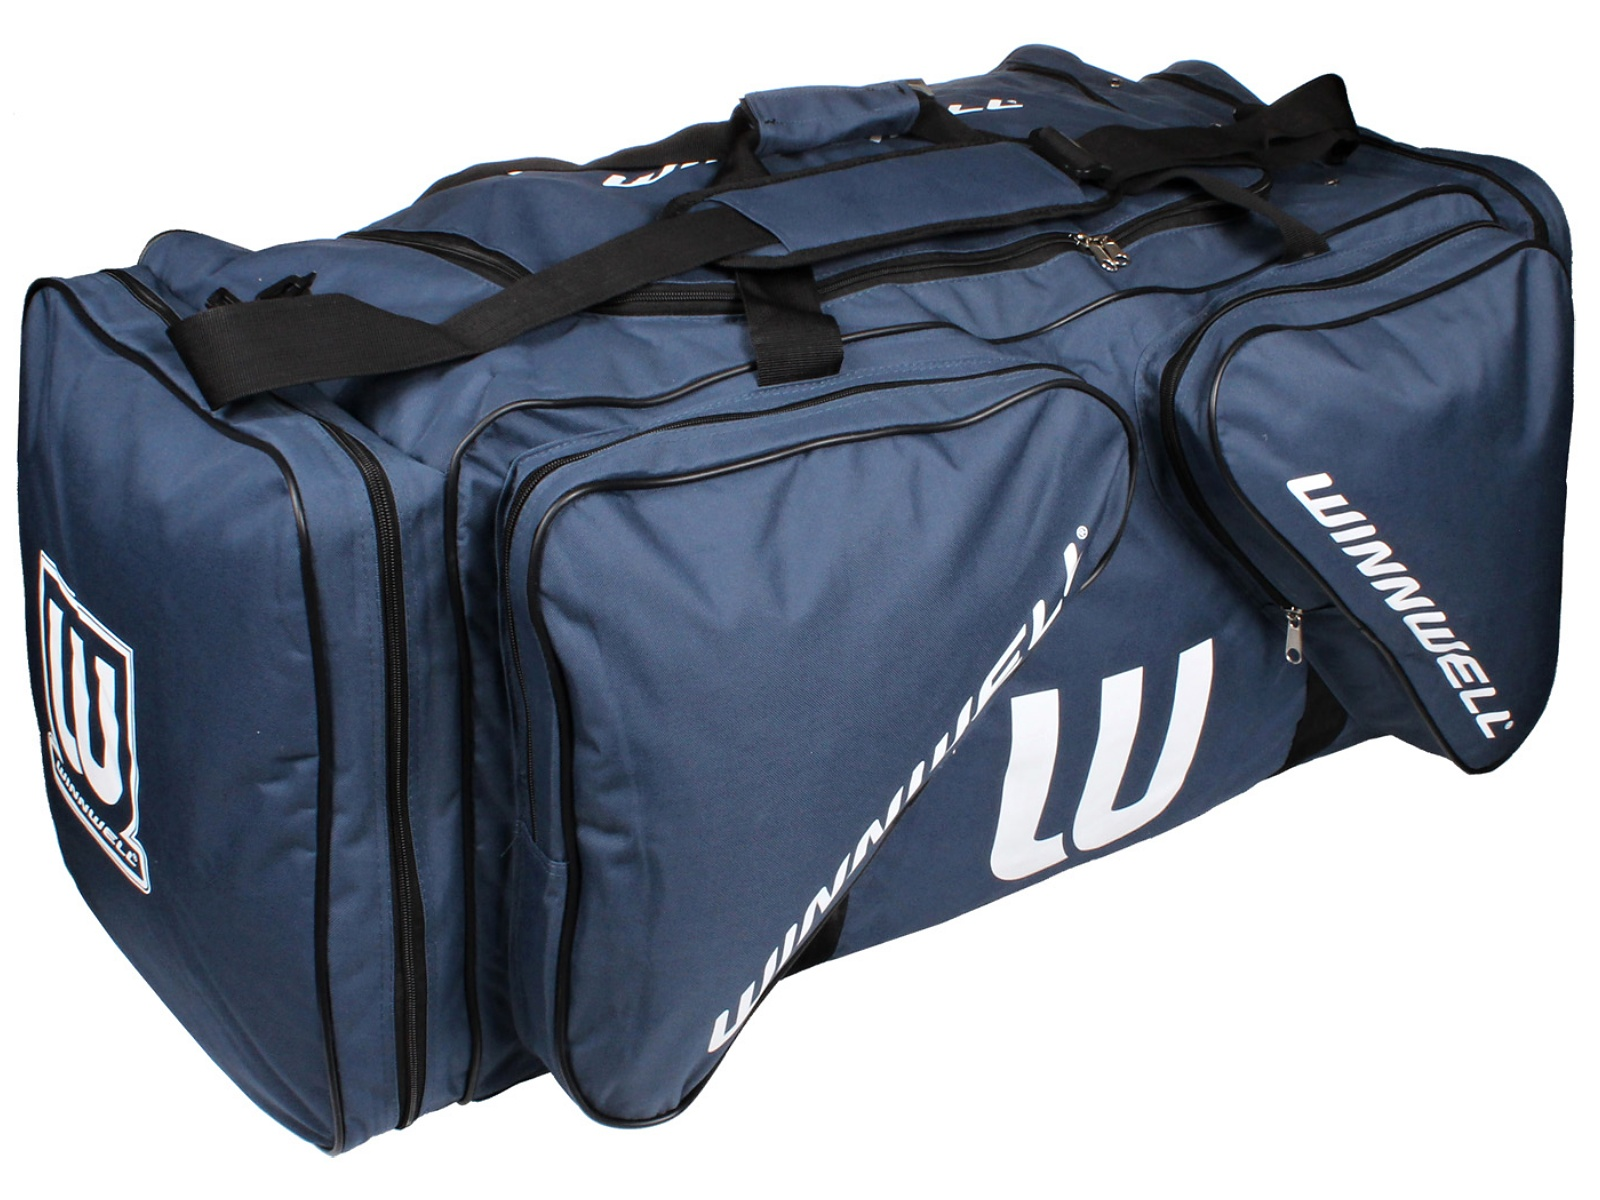 Hokejová taška WINNWELL Carry Bag JR tmavo-modrá